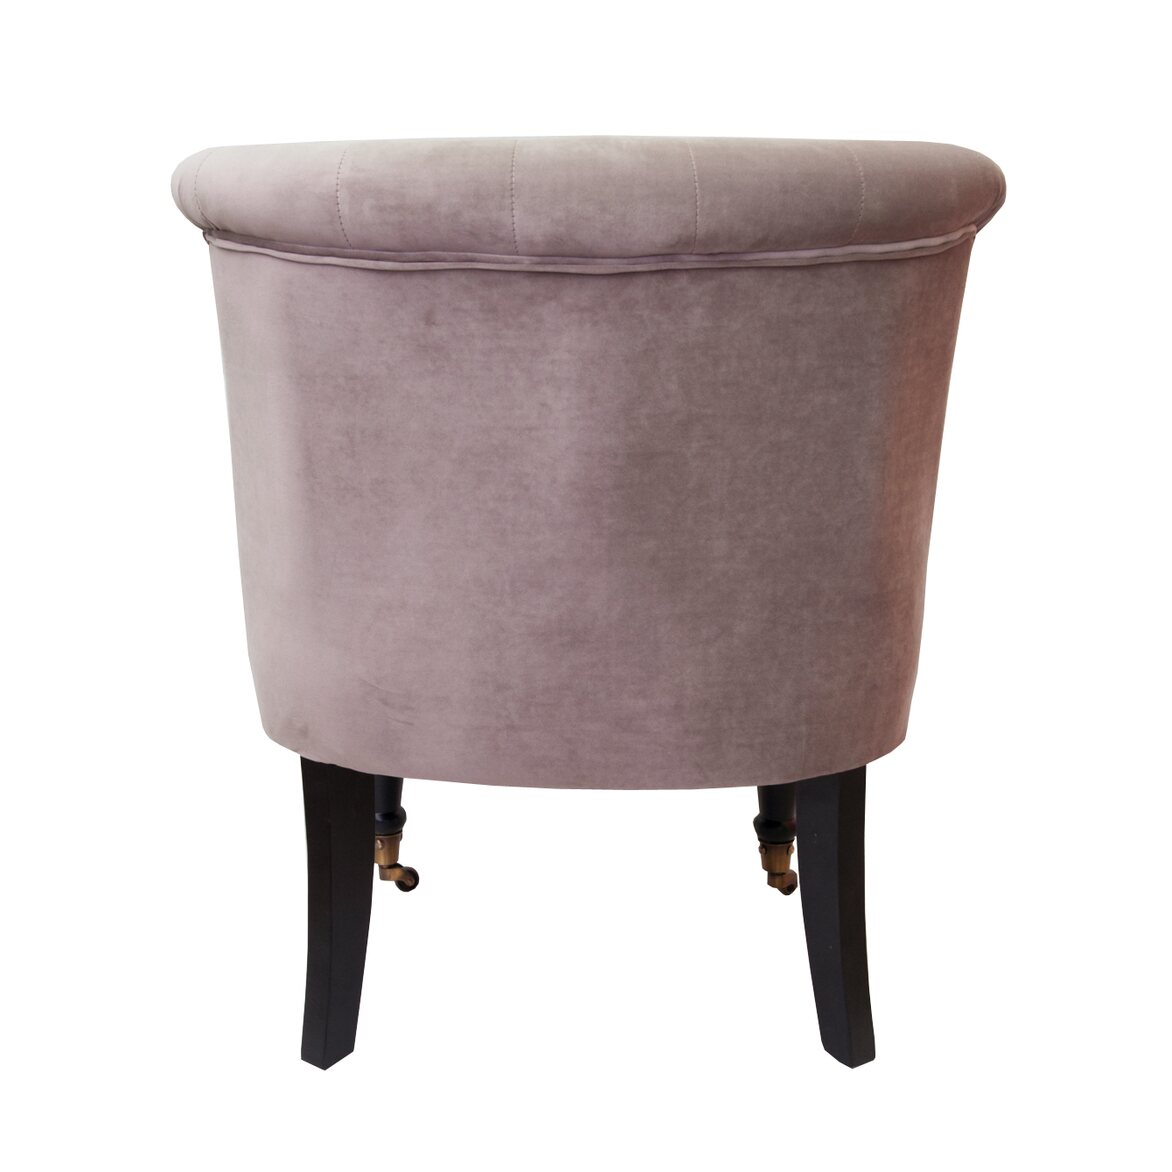 Низкое кресло Aviana taupe velvet 3   Маленькие кресла Kingsby